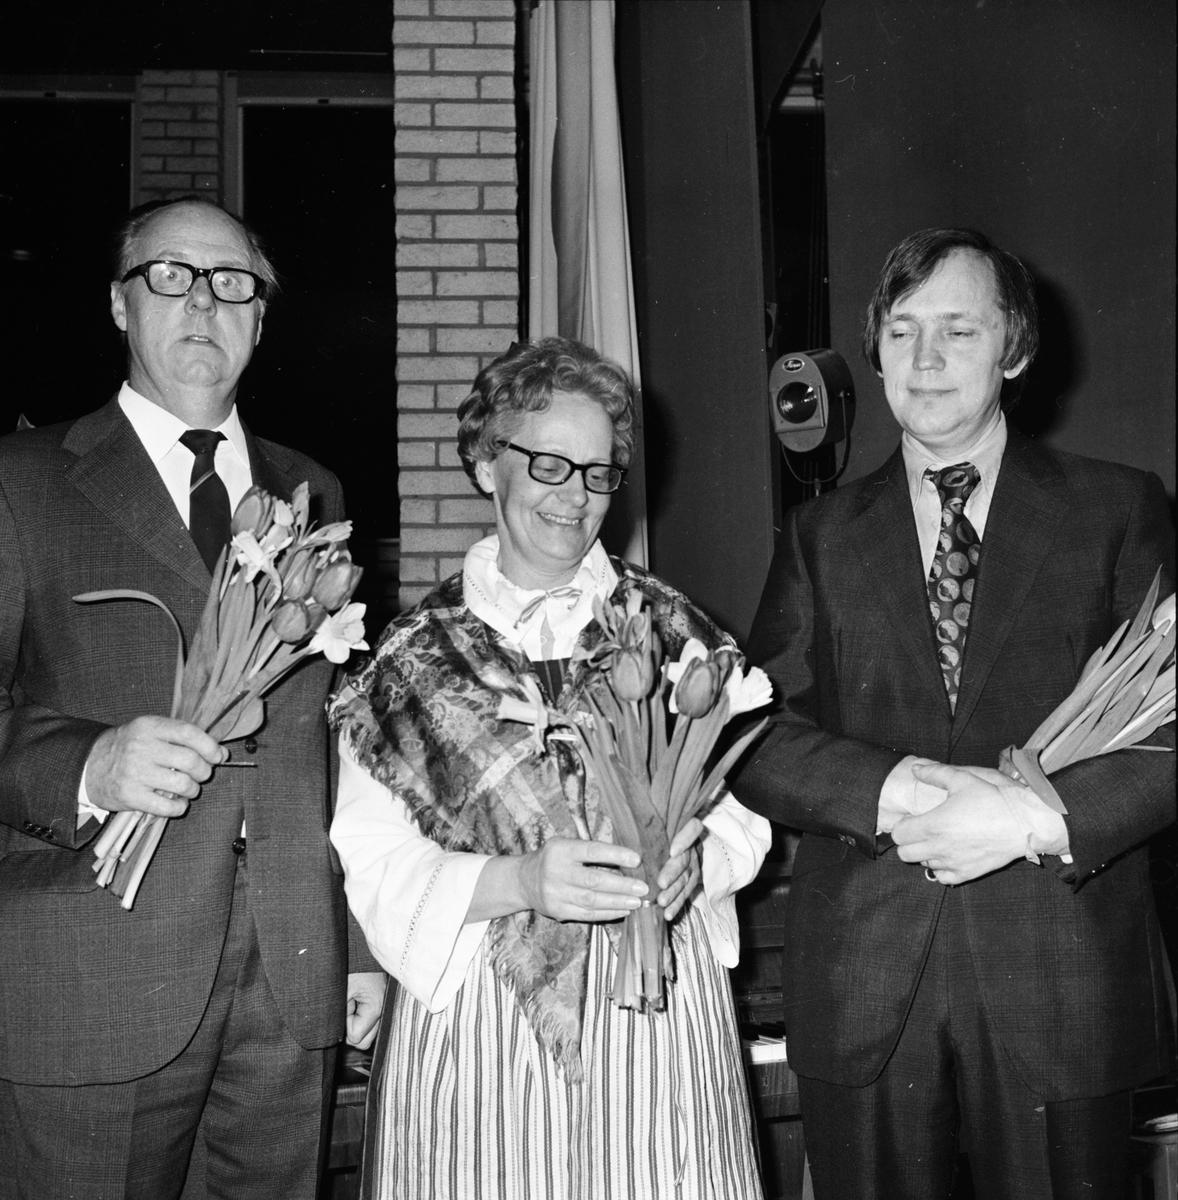 Forum Soare, Astrid Häger, Hägglund-Larsson, Mars 1972